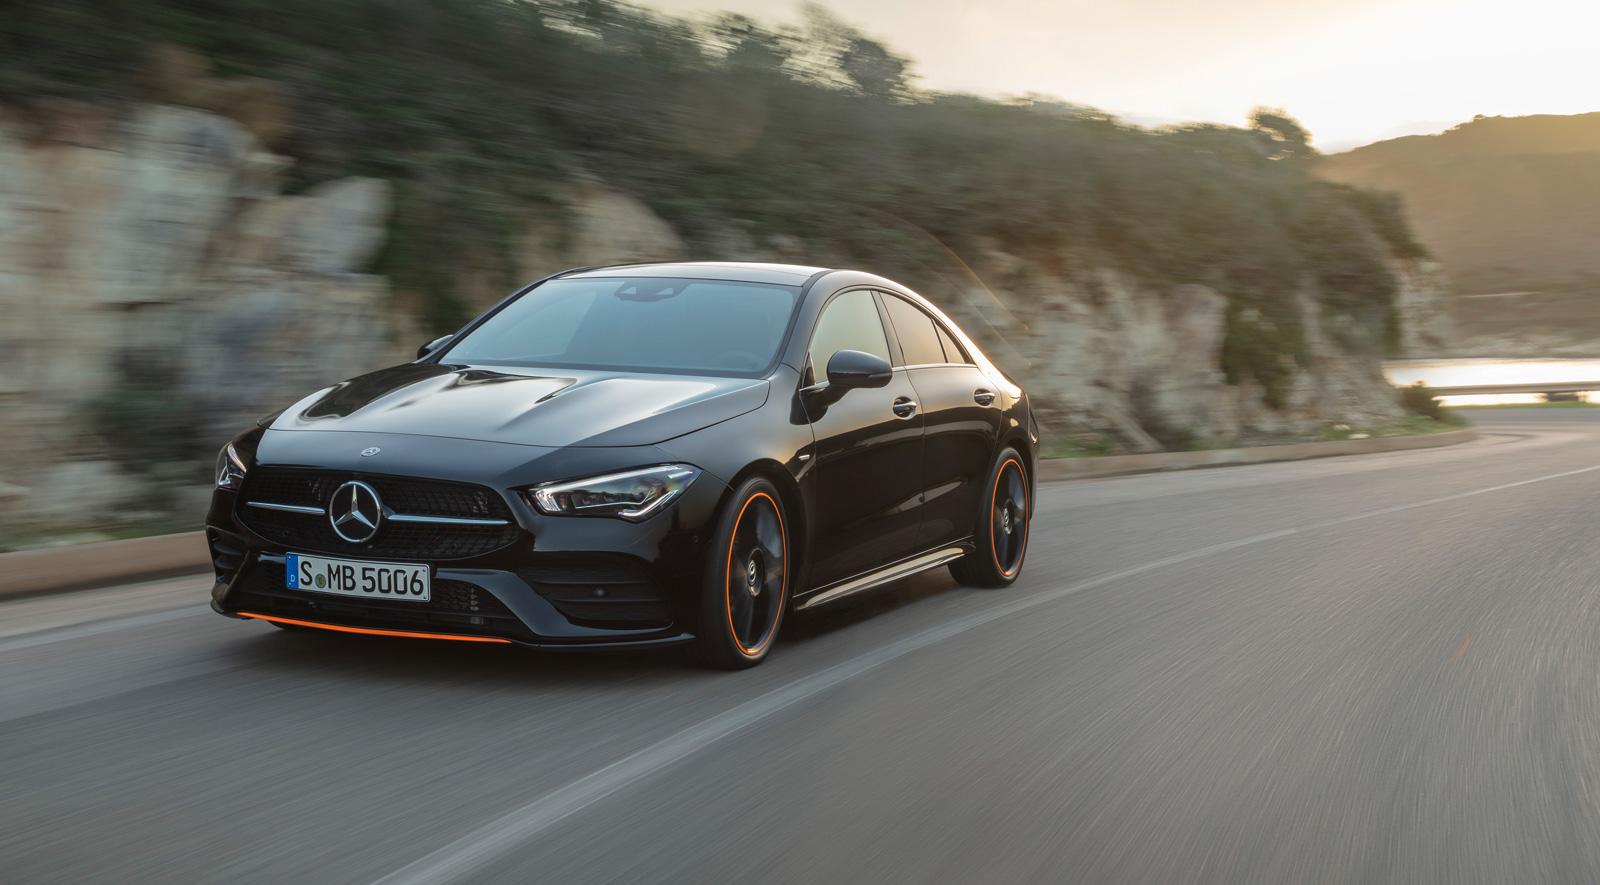 Svenska priser för nya Mercedes-Benz CLA Coupé